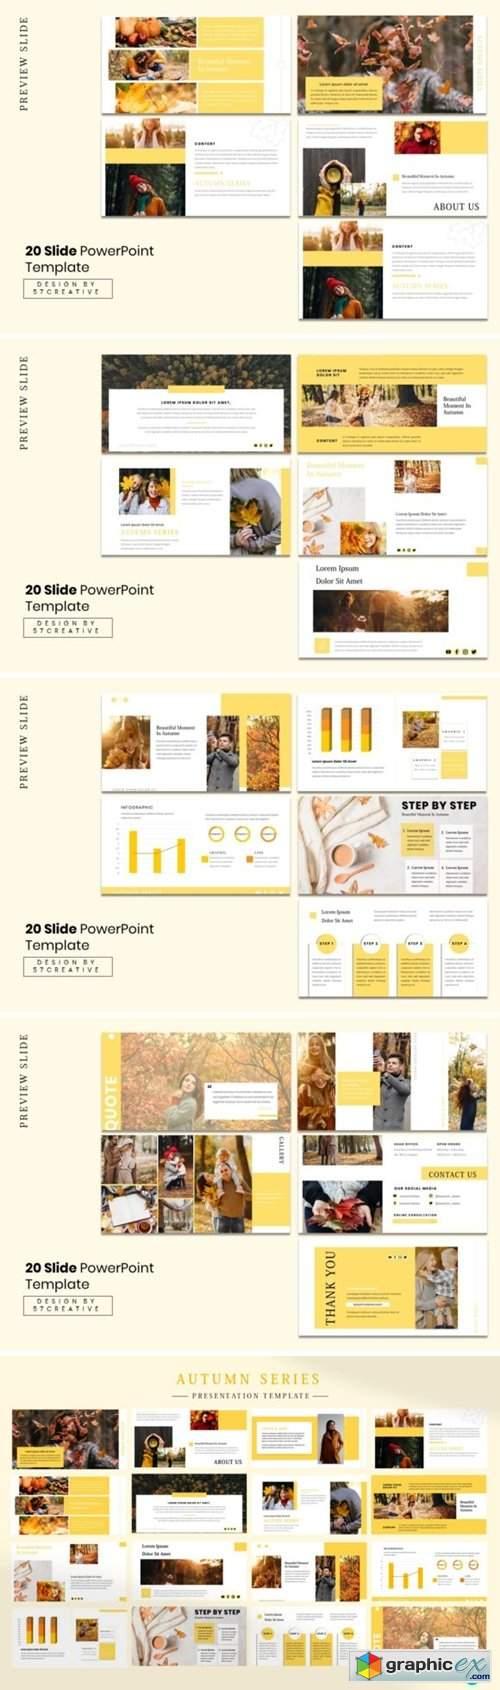 Presentation Template - Autumn Series